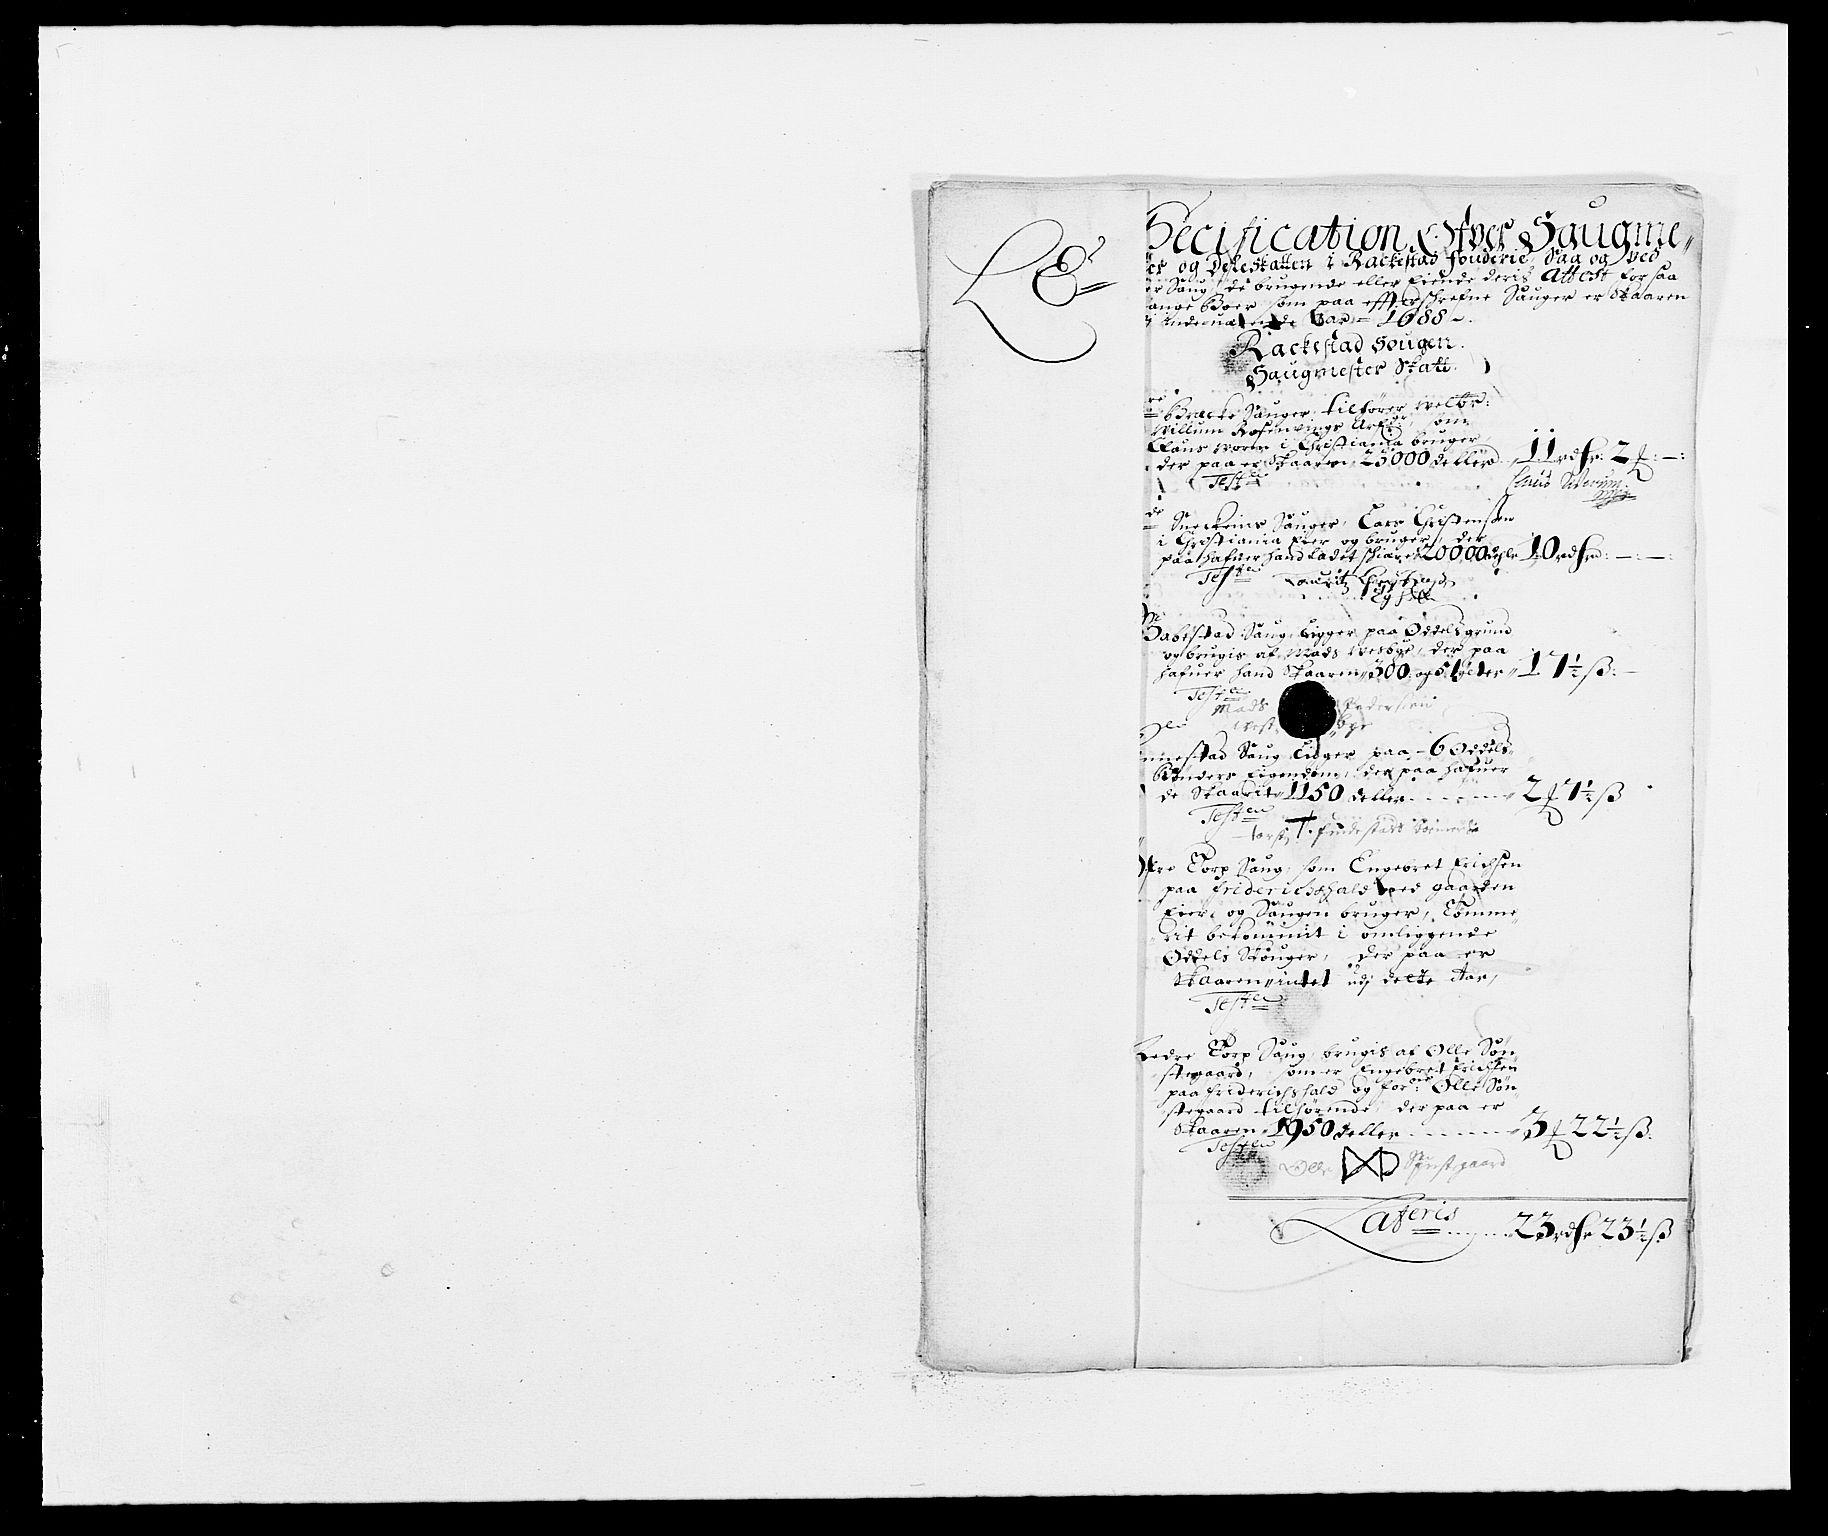 RA, Rentekammeret inntil 1814, Reviderte regnskaper, Fogderegnskap, R05/L0276: Fogderegnskap Rakkestad, 1683-1688, s. 218